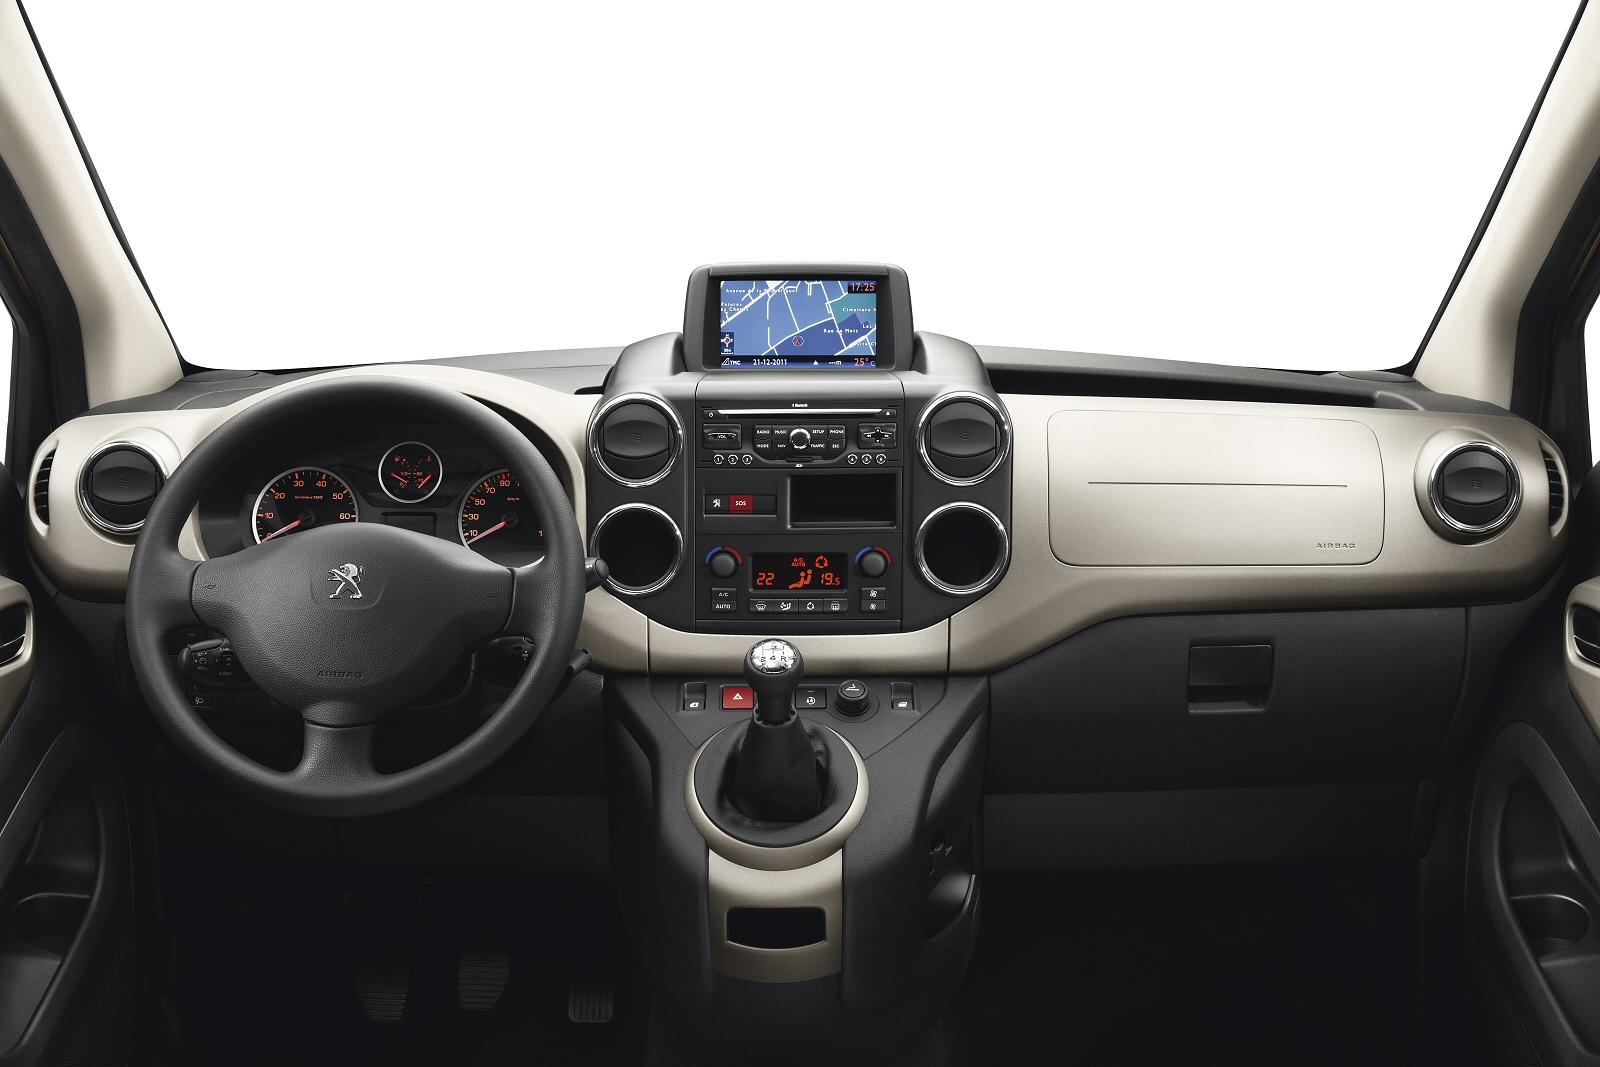 New Peugeot Partner Tepee 1 6 Vti 98 Active 5dr Petrol